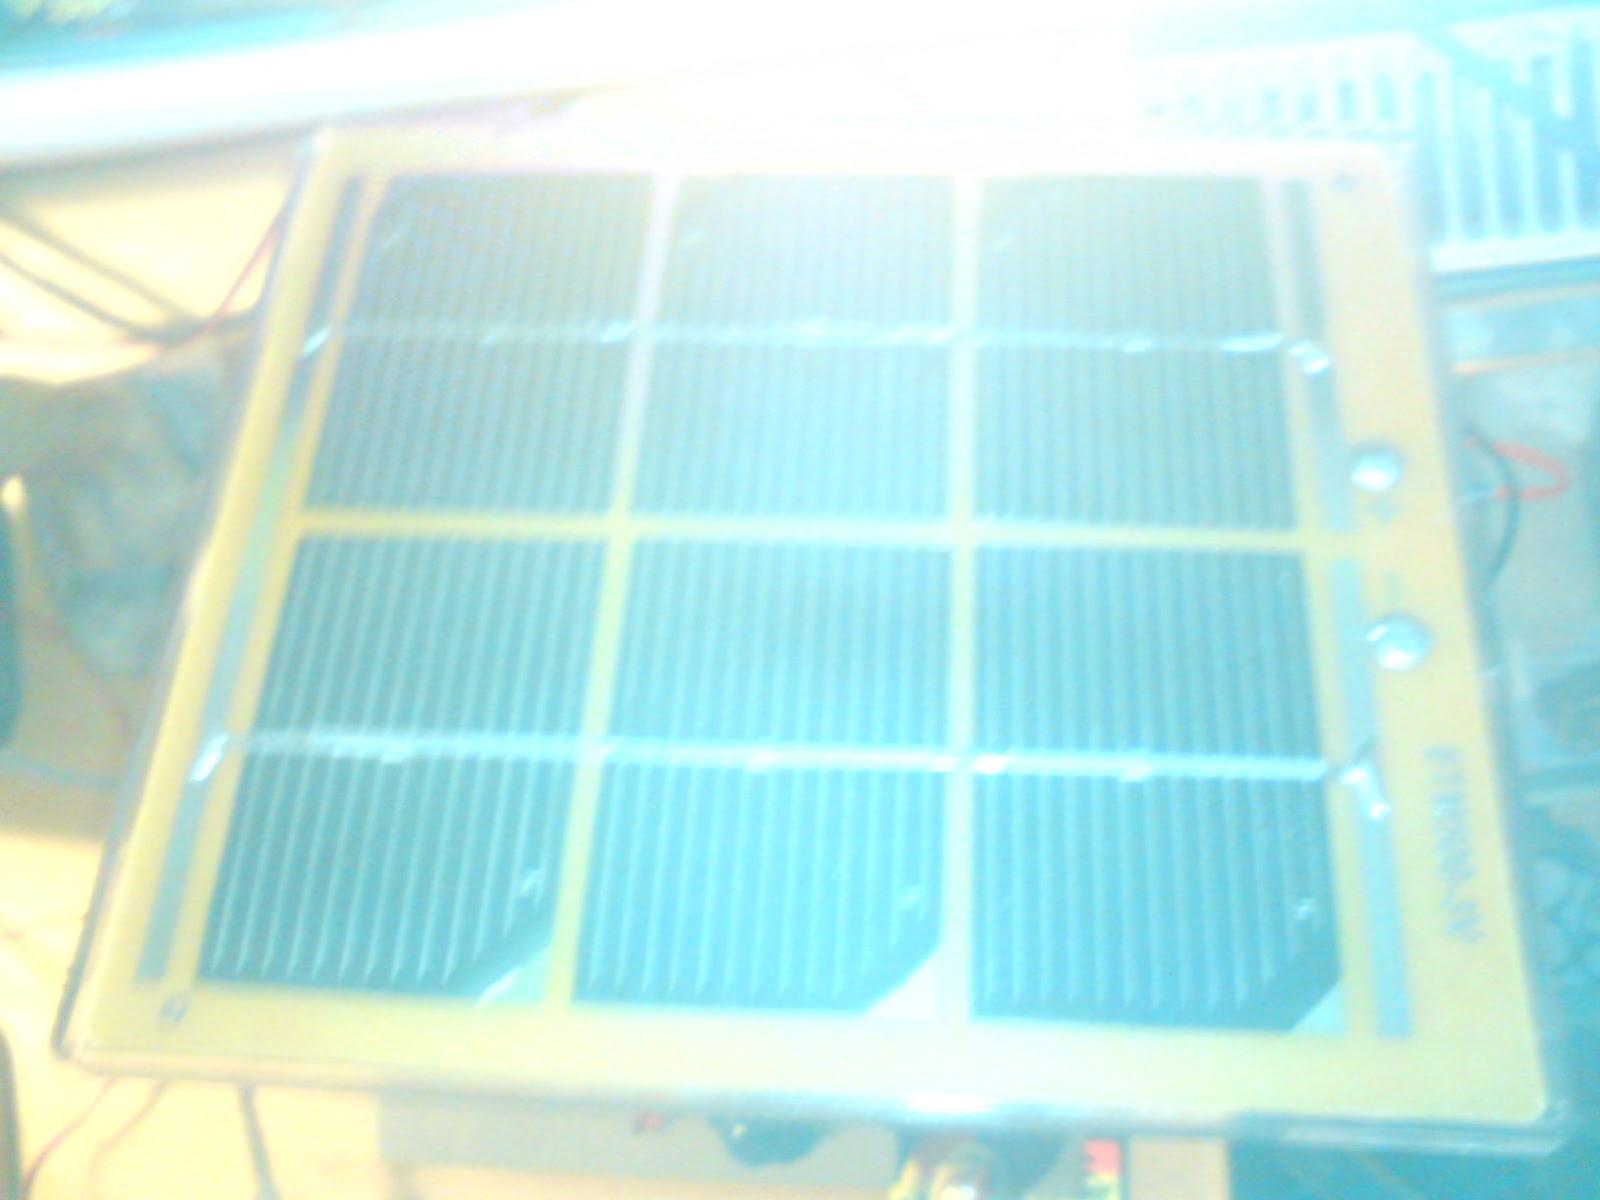 Arduino and solar cells vanceance